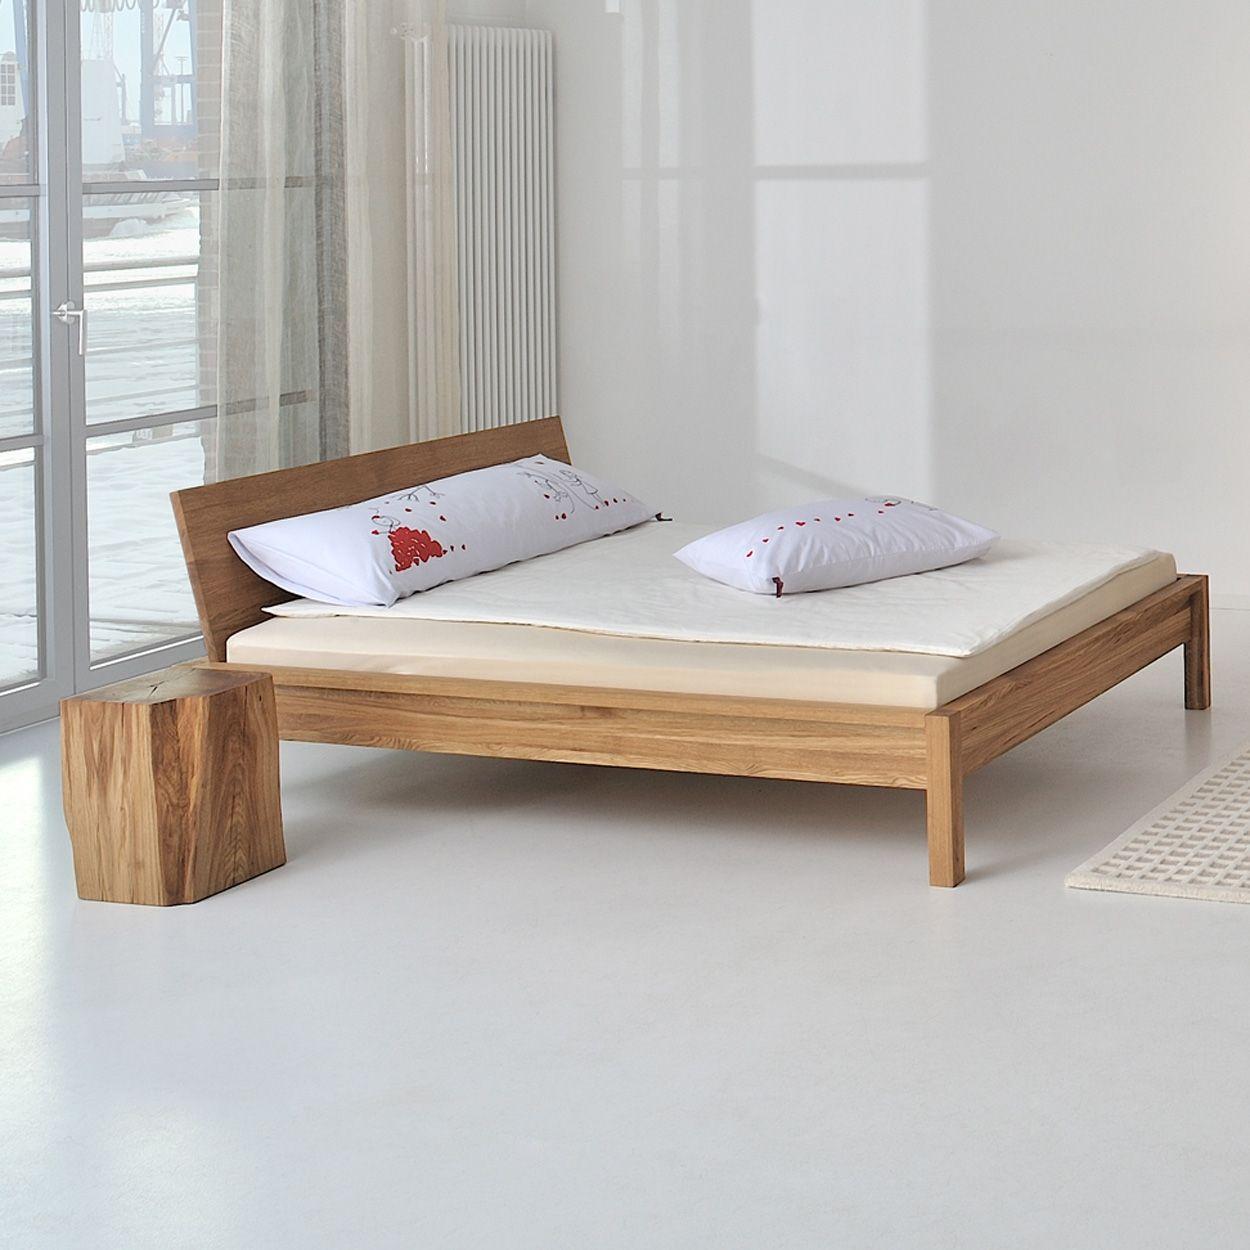 Full Size of Bett Holz Design Schlafzimmer Mit 22 Unterbett Metall Betten 180x200 Weiß 200x220 Schubladen 160x200 200x180 Günstig Kaufen Mädchen Massivholz Jugend Buche Bett Bett Holz